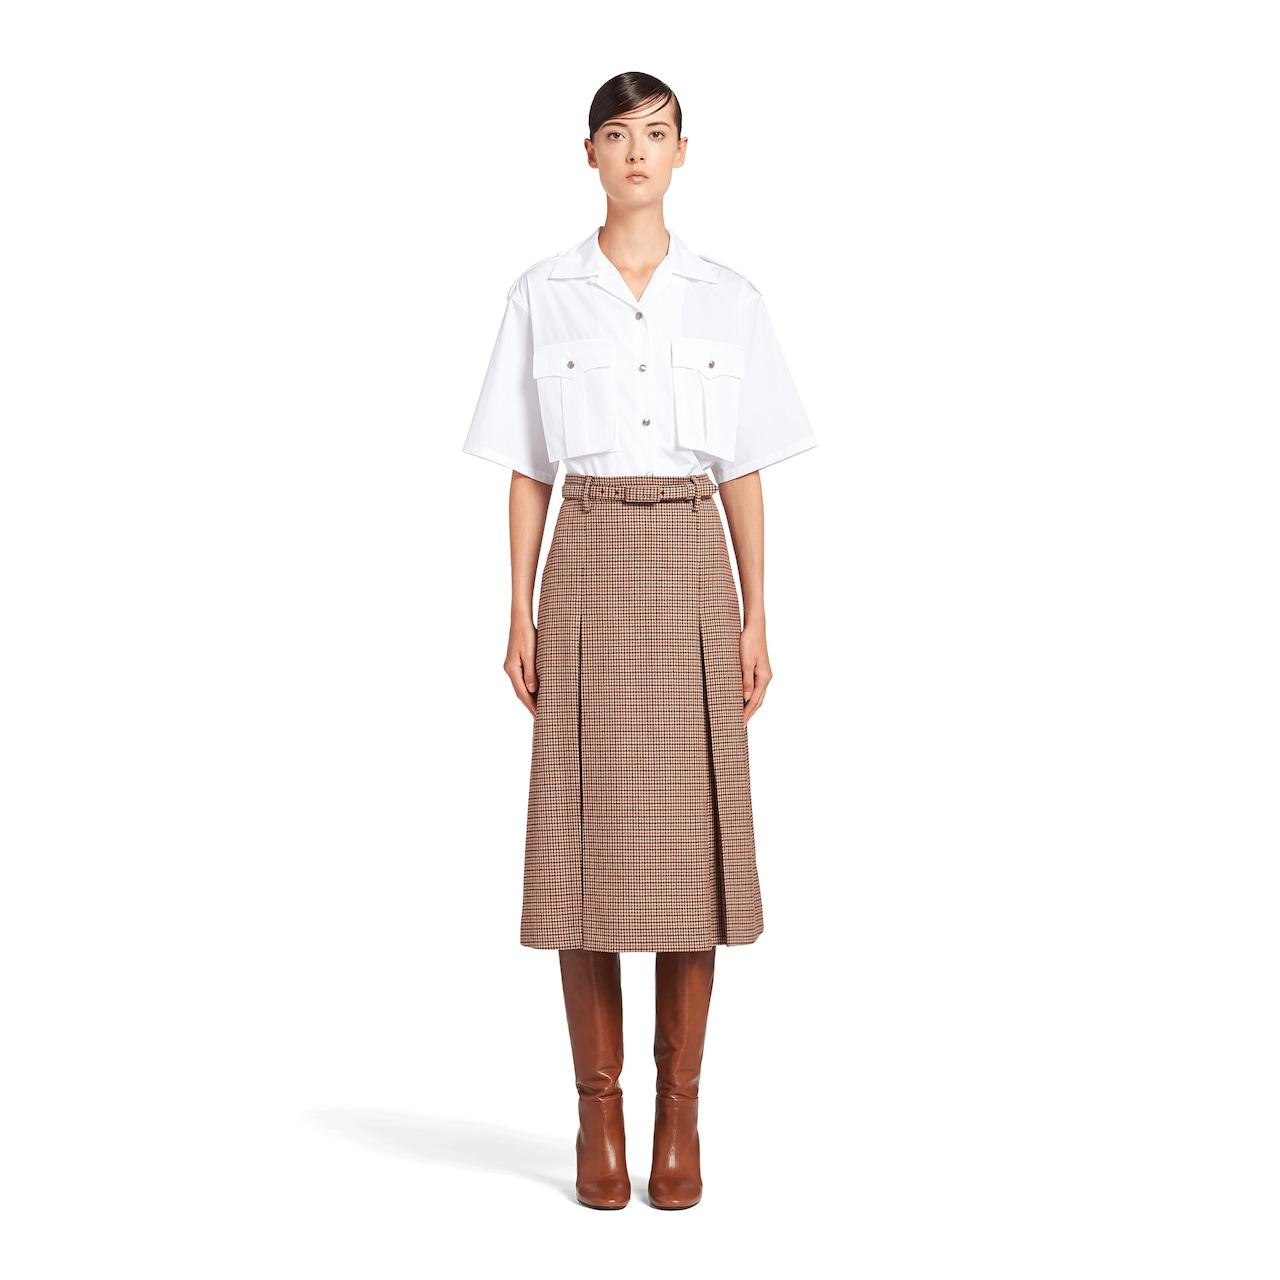 Houndstooth check skirt